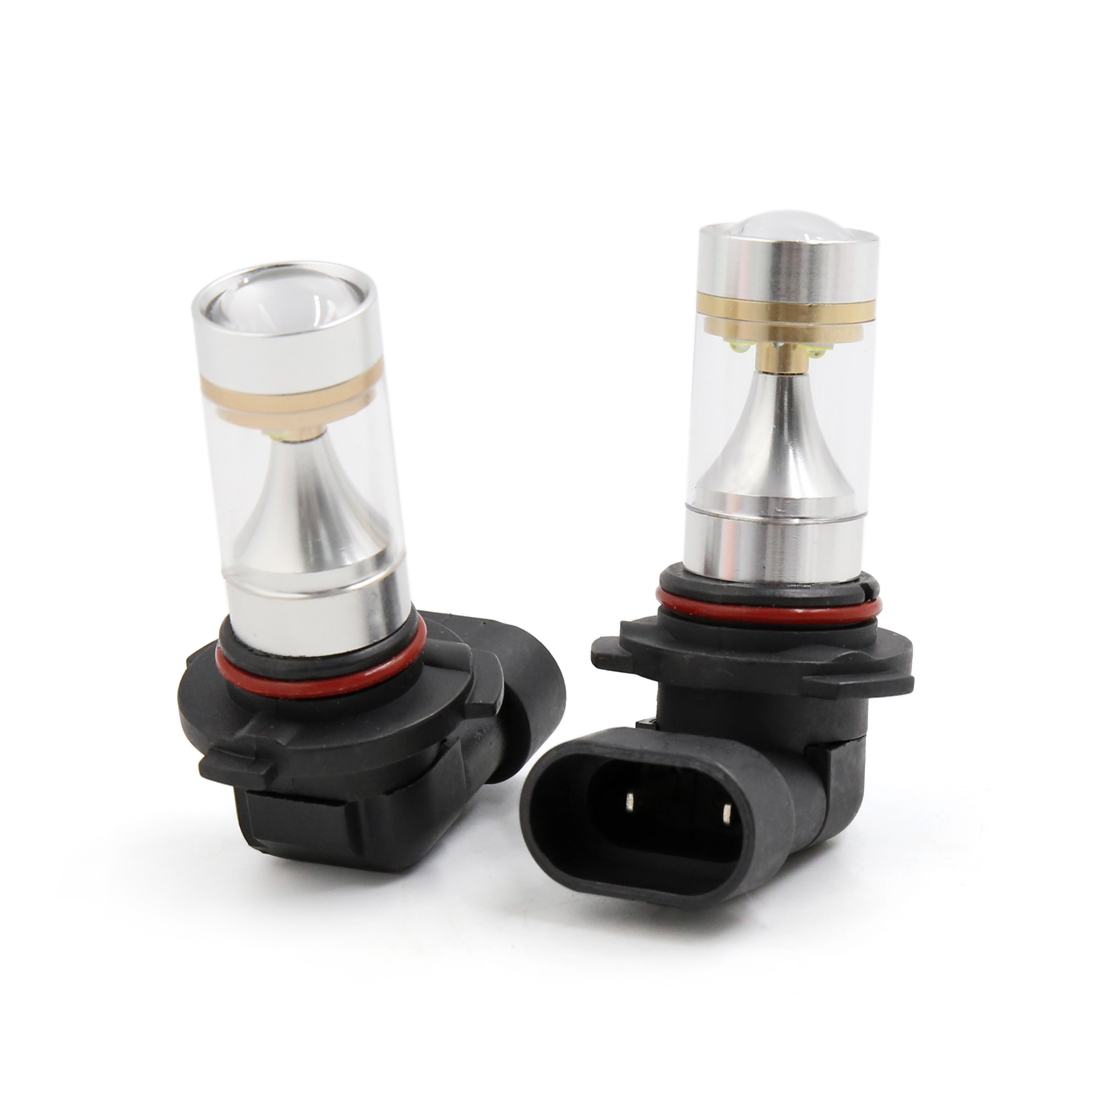 2Pcs 9005 White 6 2525 SMD LEDs Projector Lens Fog Headlight Bulb for Car